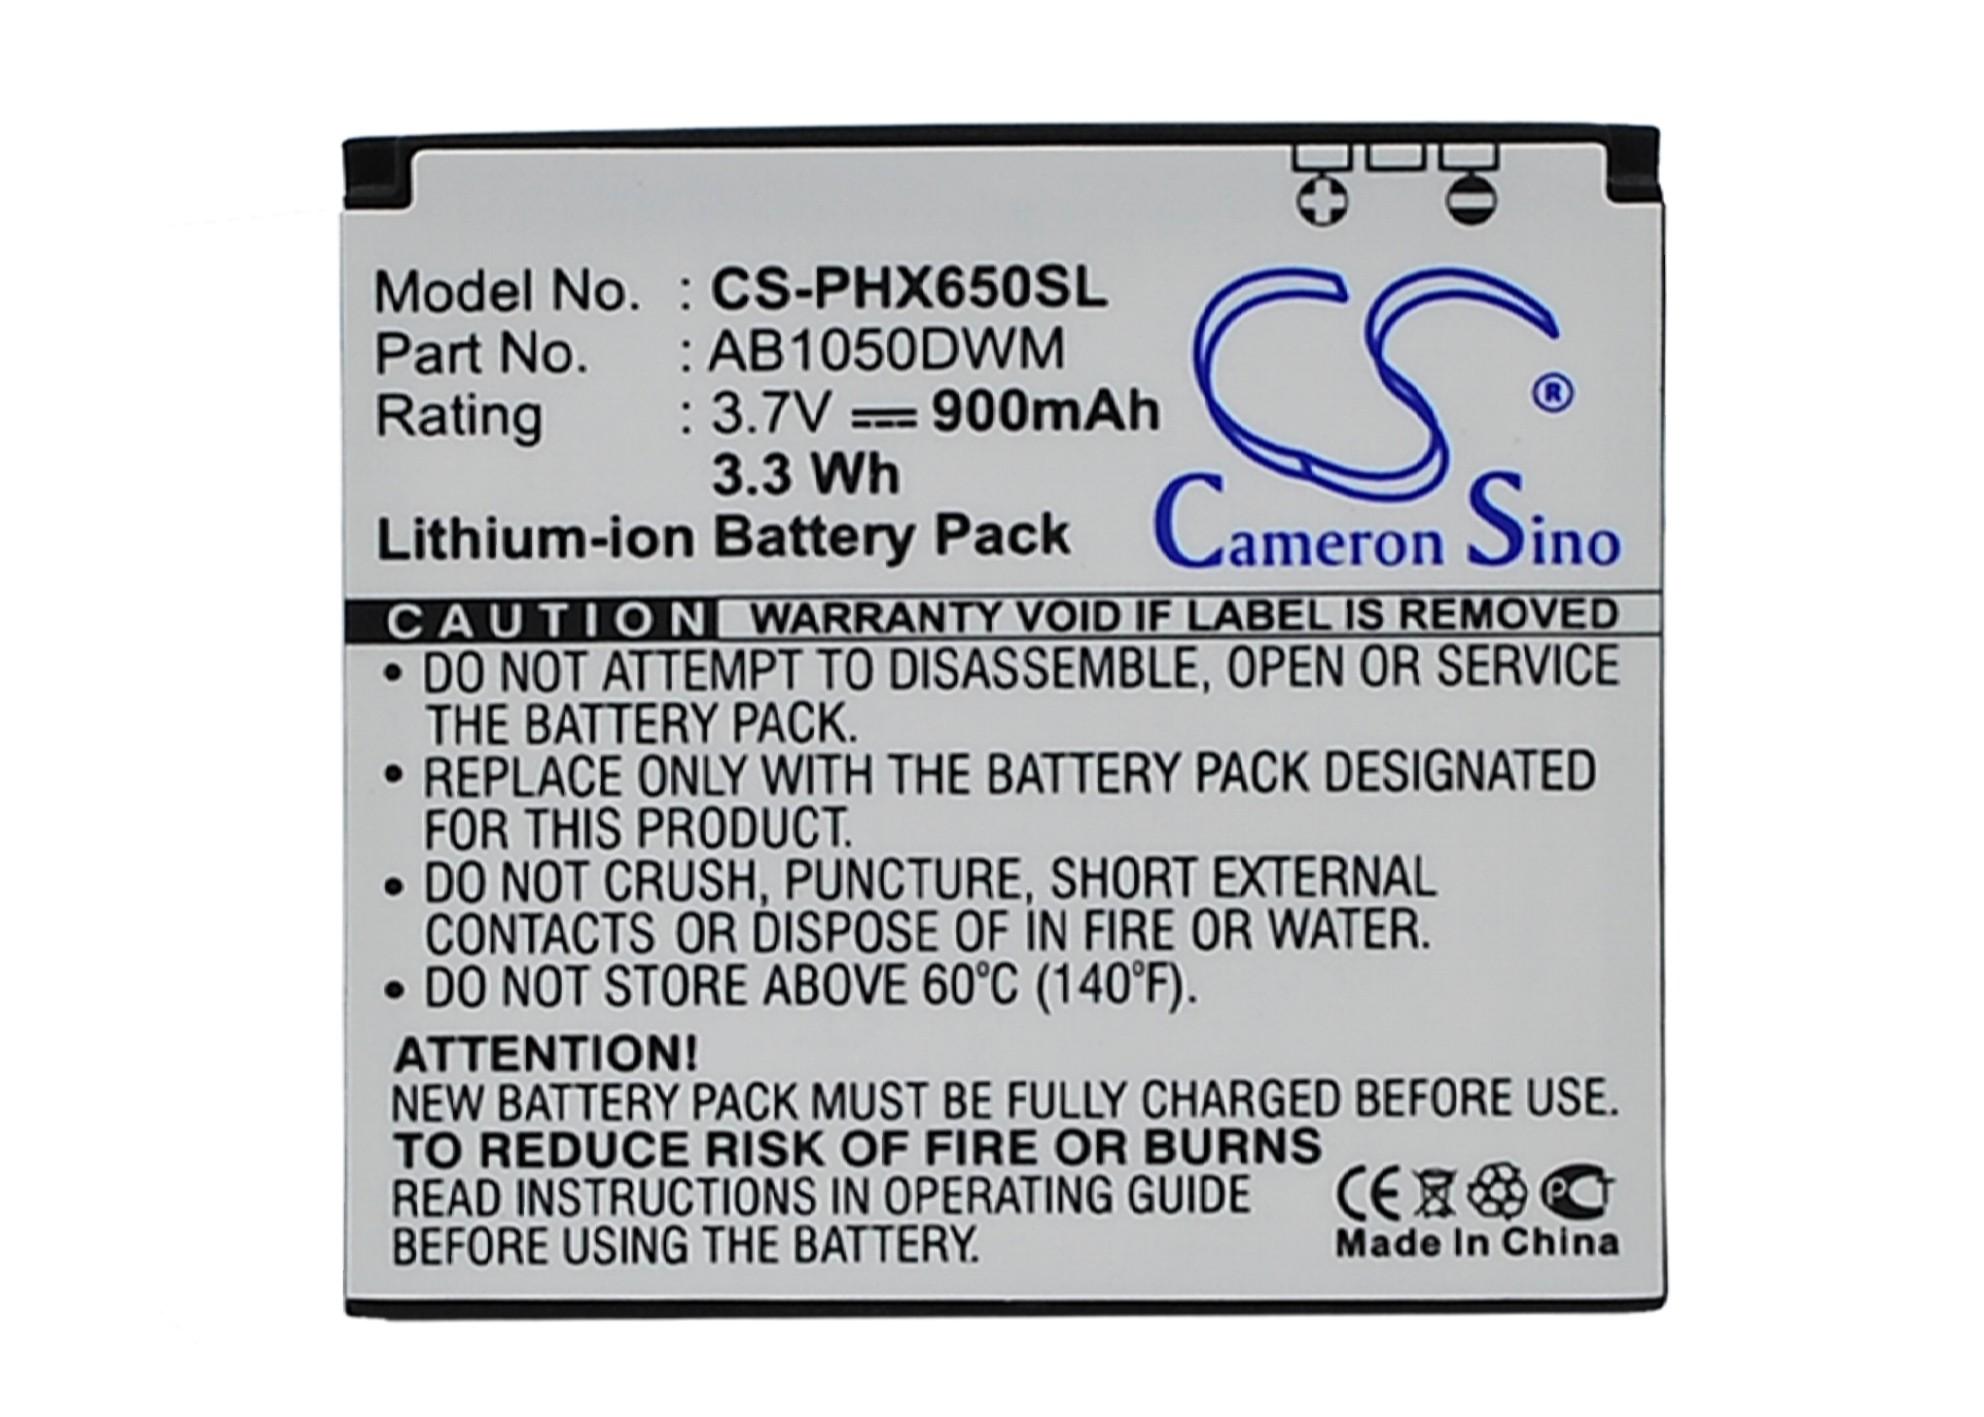 Cameron Sino baterie do mobilů pro PHILIPS Xenium X650 3.7V Li-ion 900mAh černá - neoriginální